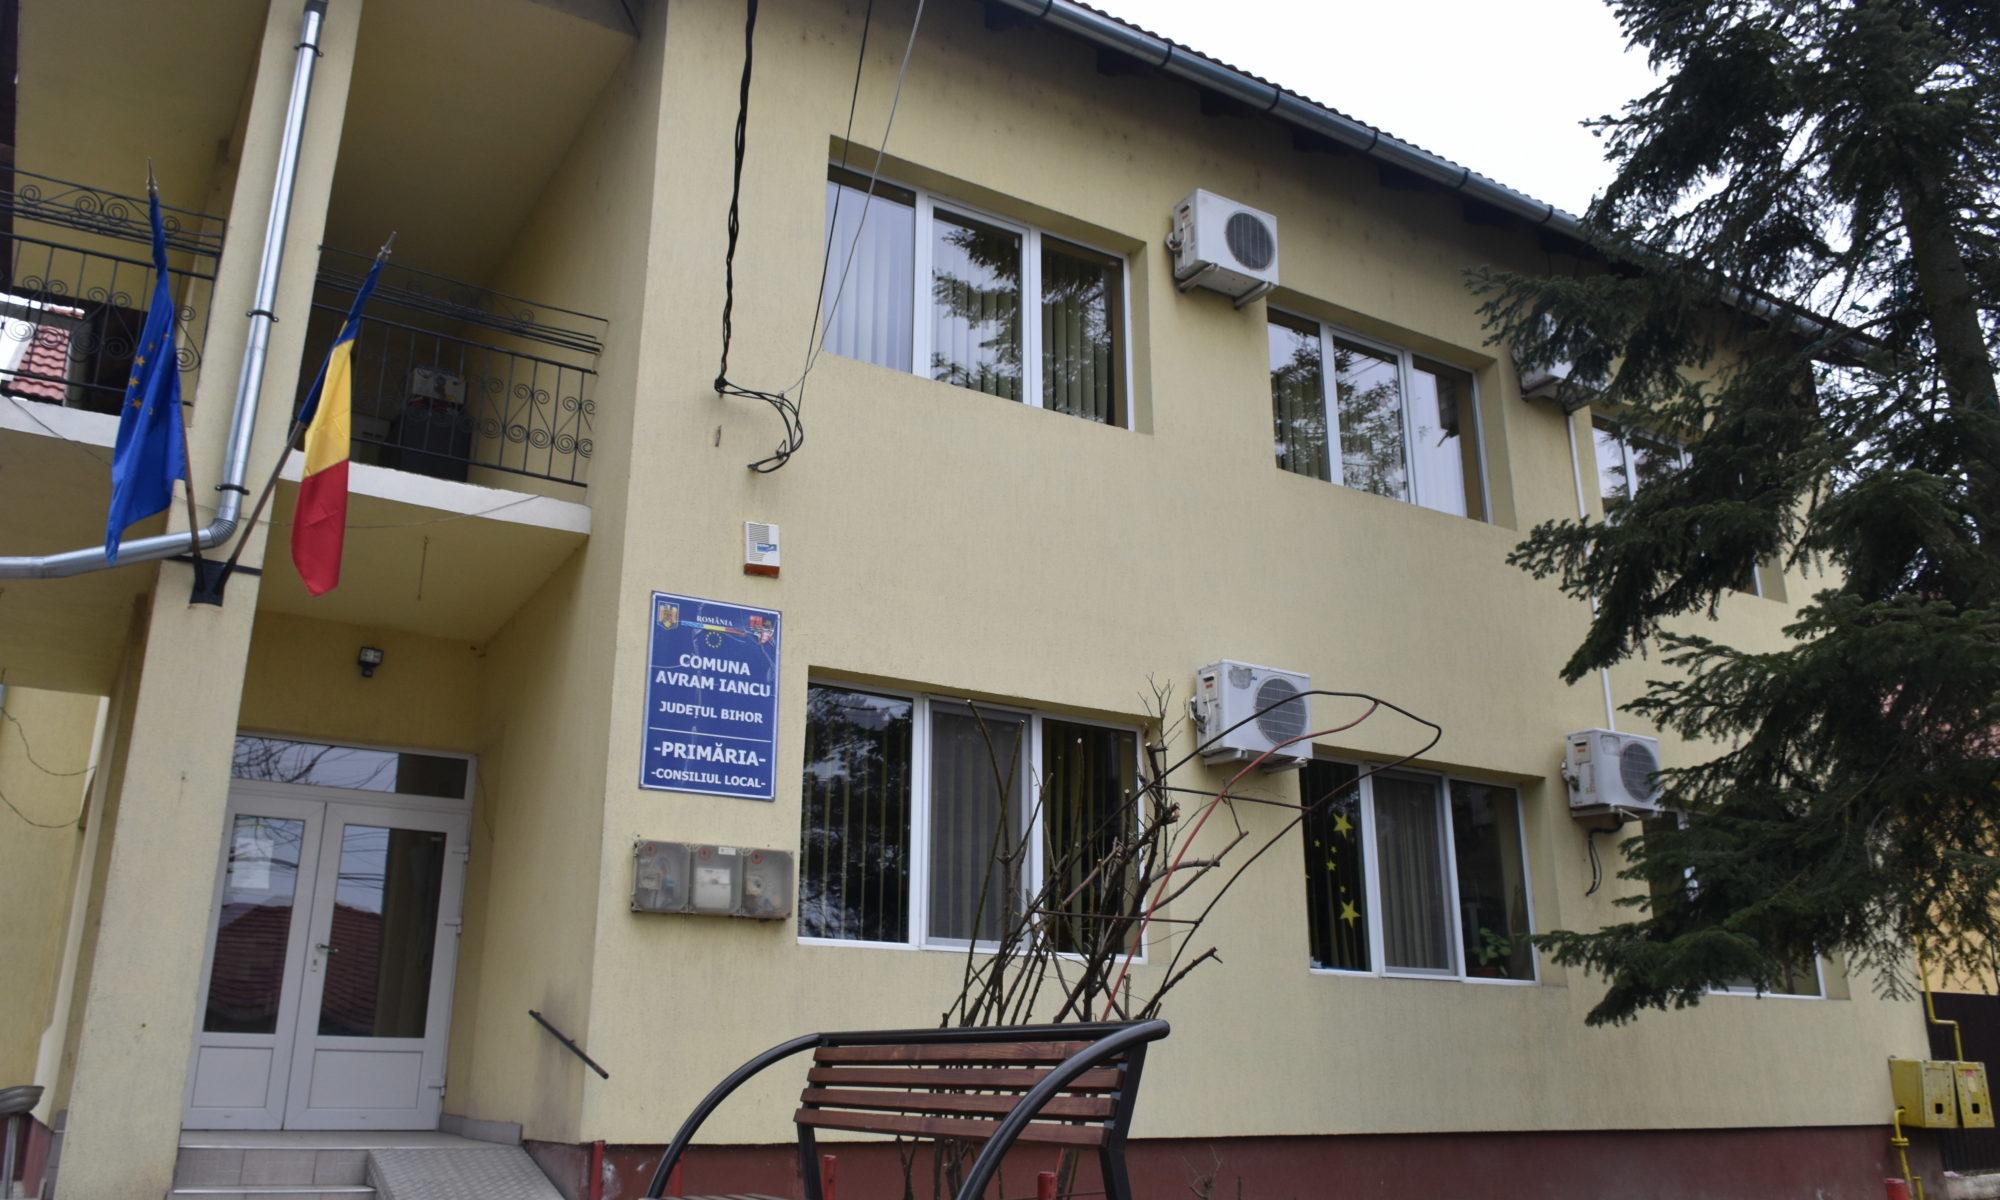 Primăria comuniei Avram Iancu - jud. Bihor